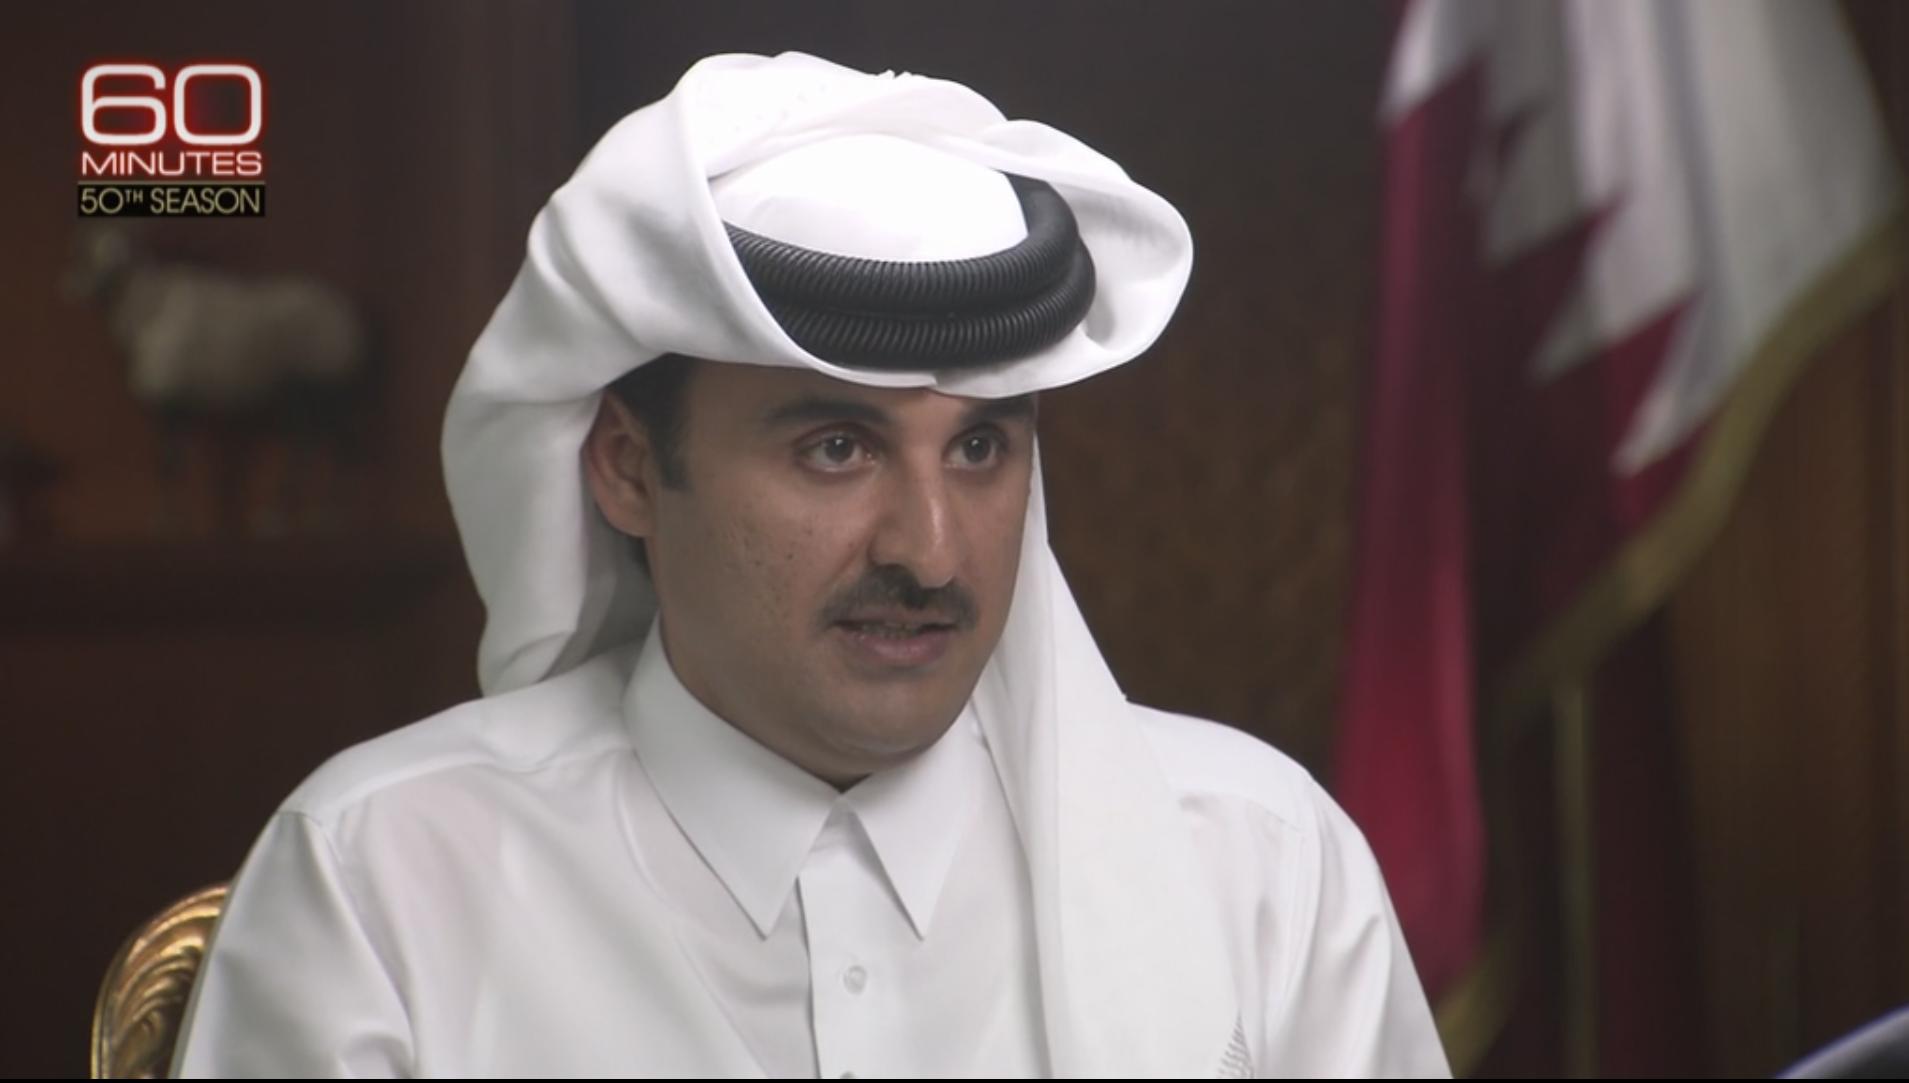 L'émir du Qatar, cheikh Tamim ben Hamad Al-Thani, sur CBS dimanche 30 octobre 2017.